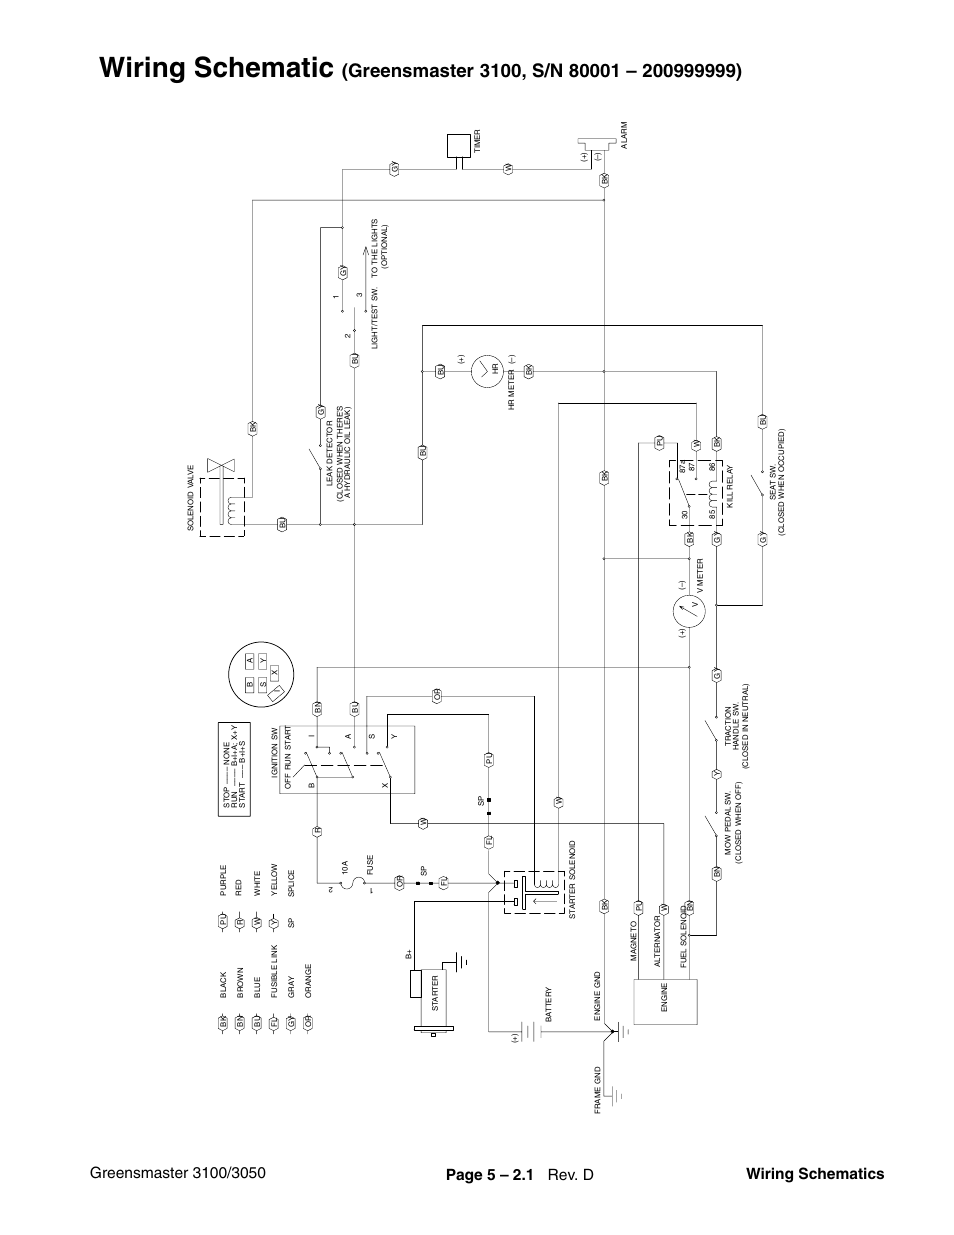 medium resolution of wiring schematic toro greensmaster 3100 user manual page 103 234